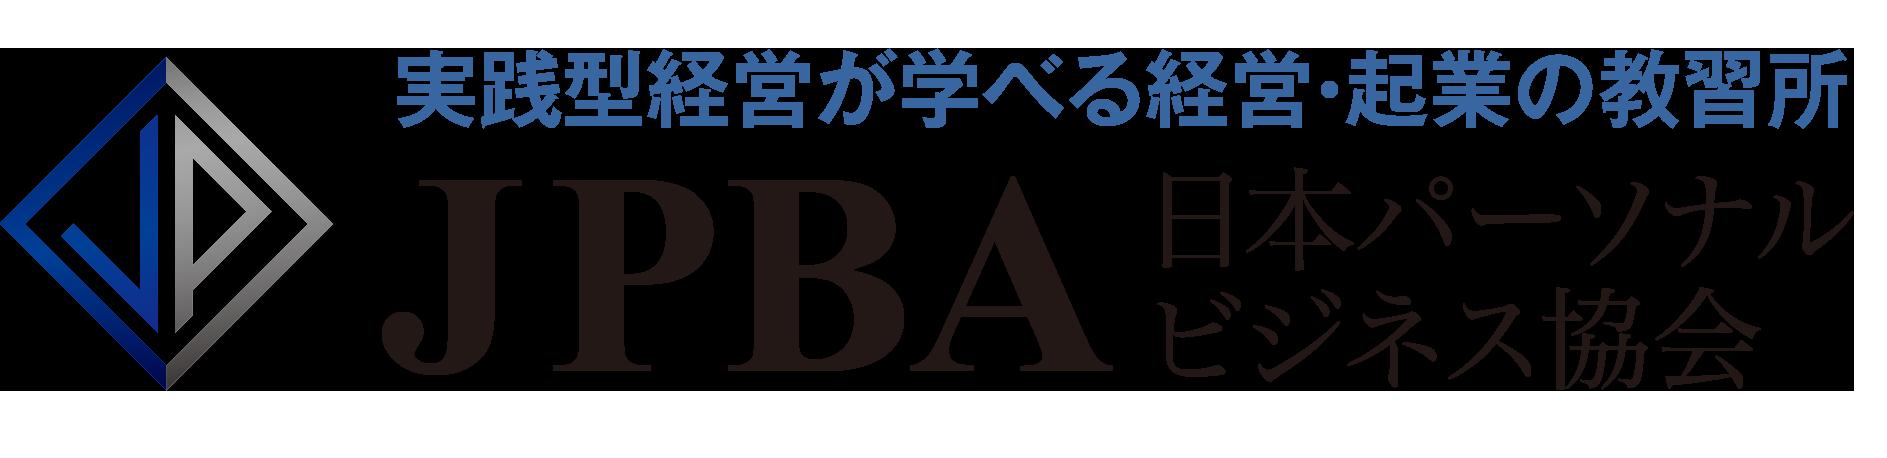 JPBA 一般社団法人日本パーソナルビジネス協会 個人に経営力を。次世代の経営者・事業家・起業家を育成する